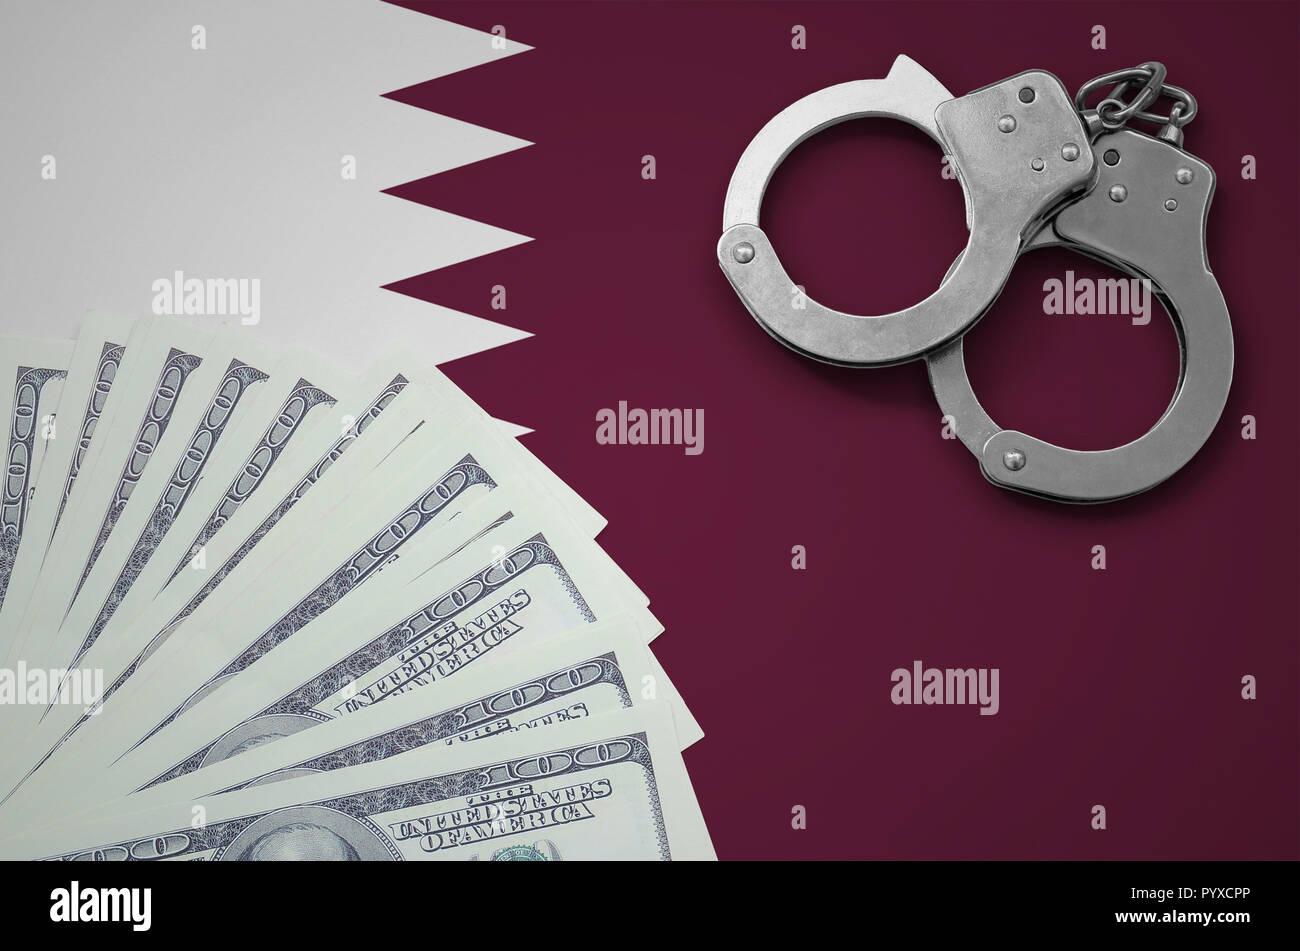 Qatar Stock Exchange Stock Photos & Qatar Stock Exchange